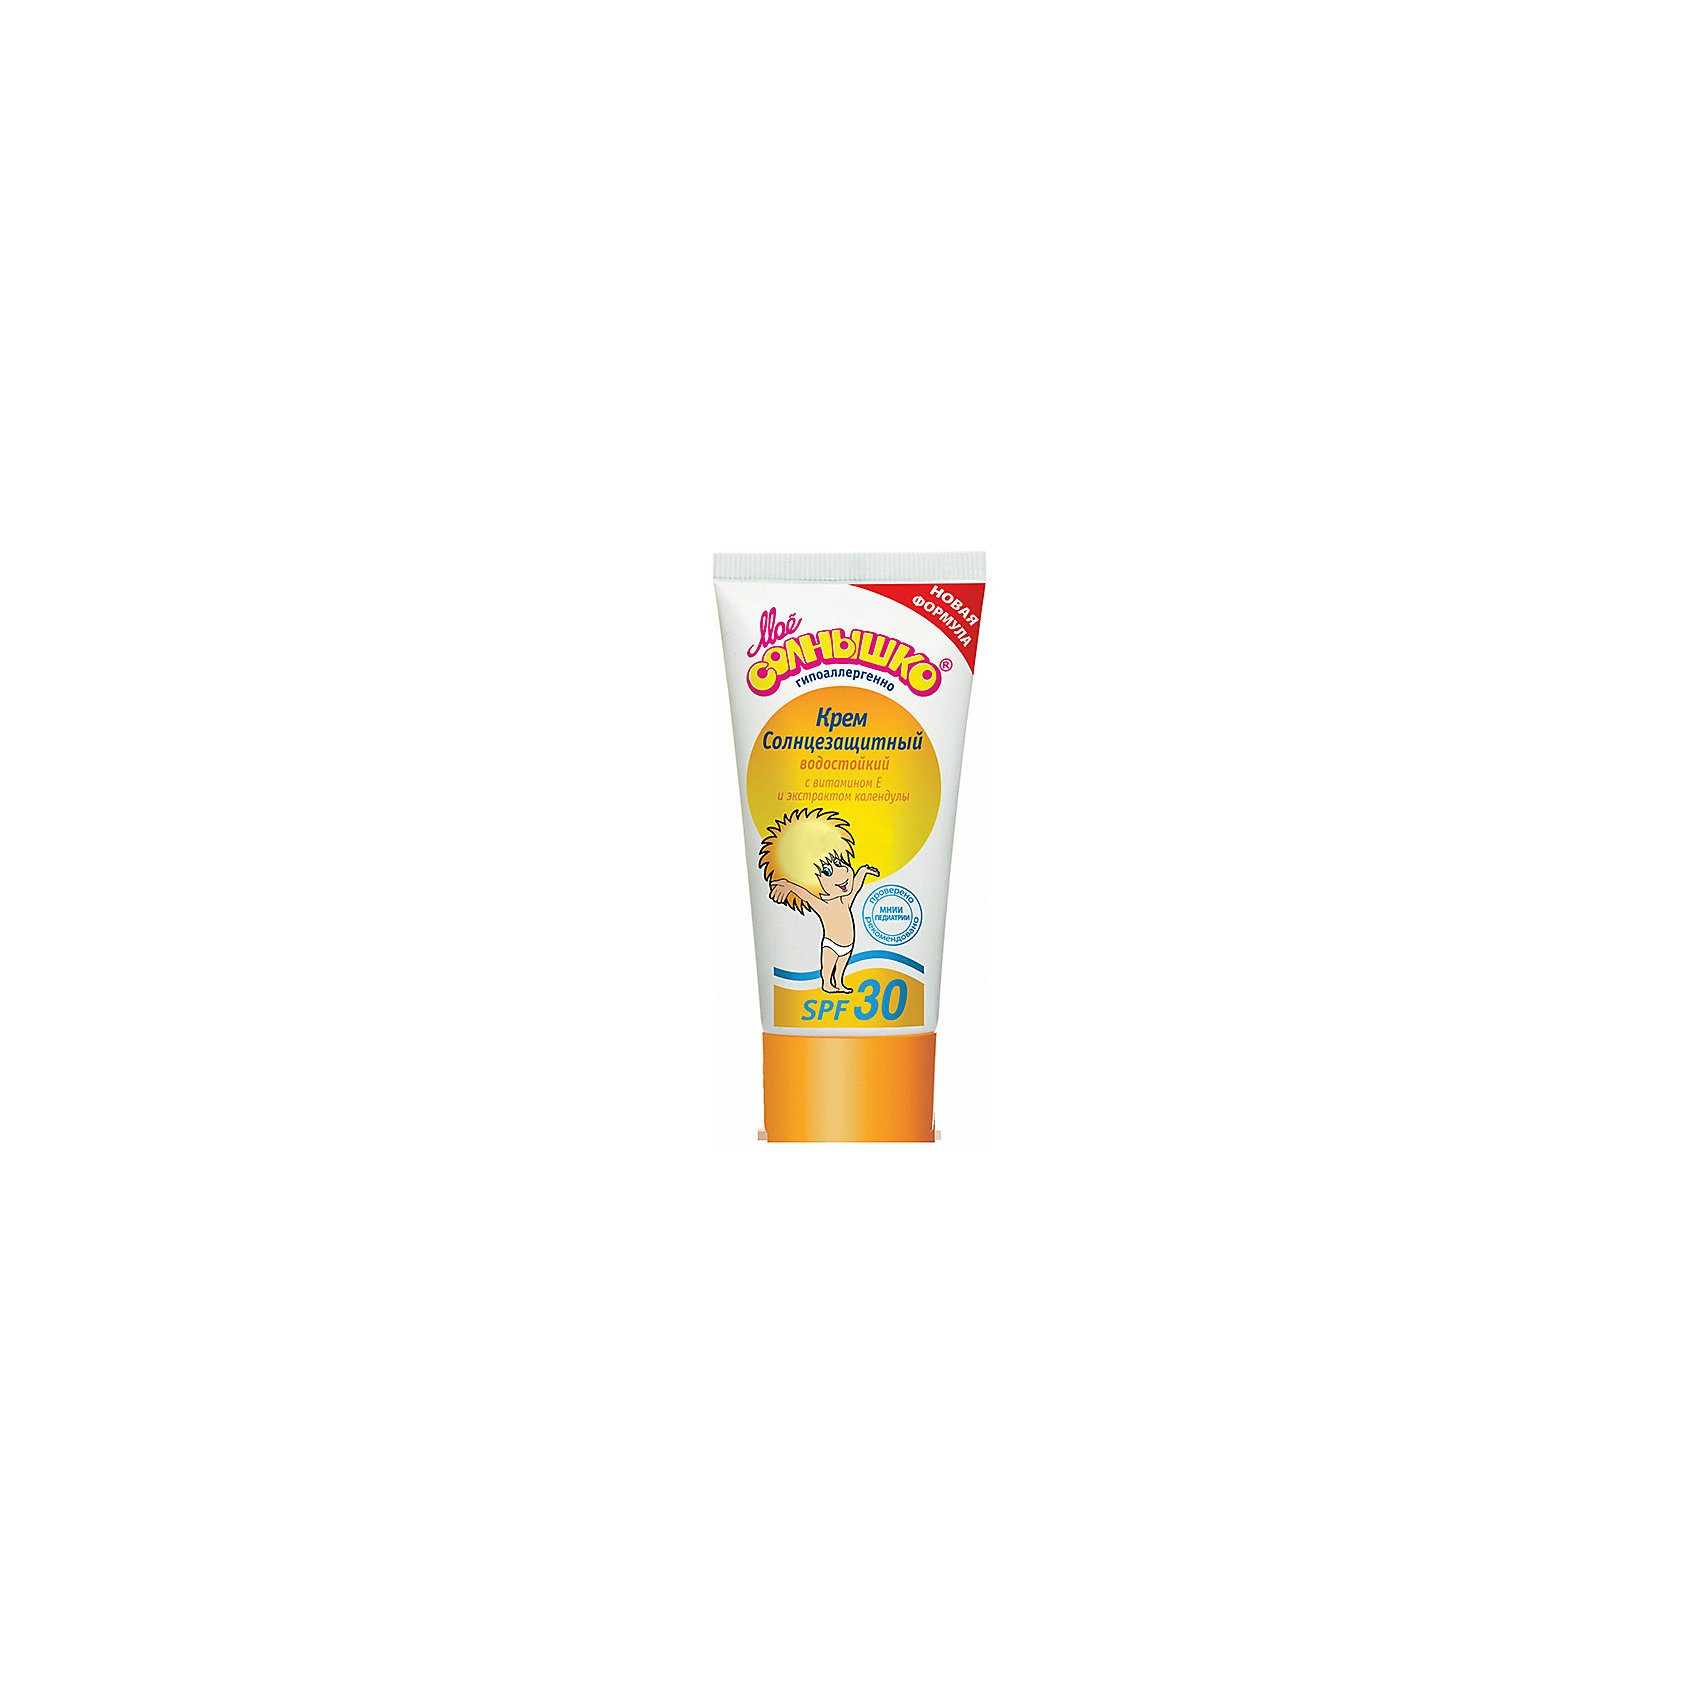 Моё солнышко Солнцезащитный крем SPF +30, 55 мл, Моё солнышко renew солнцезащитный тональный крем антиоксидант spf 30 renew whitening sunscreen cream spf 30 make up 9007100 100 мл